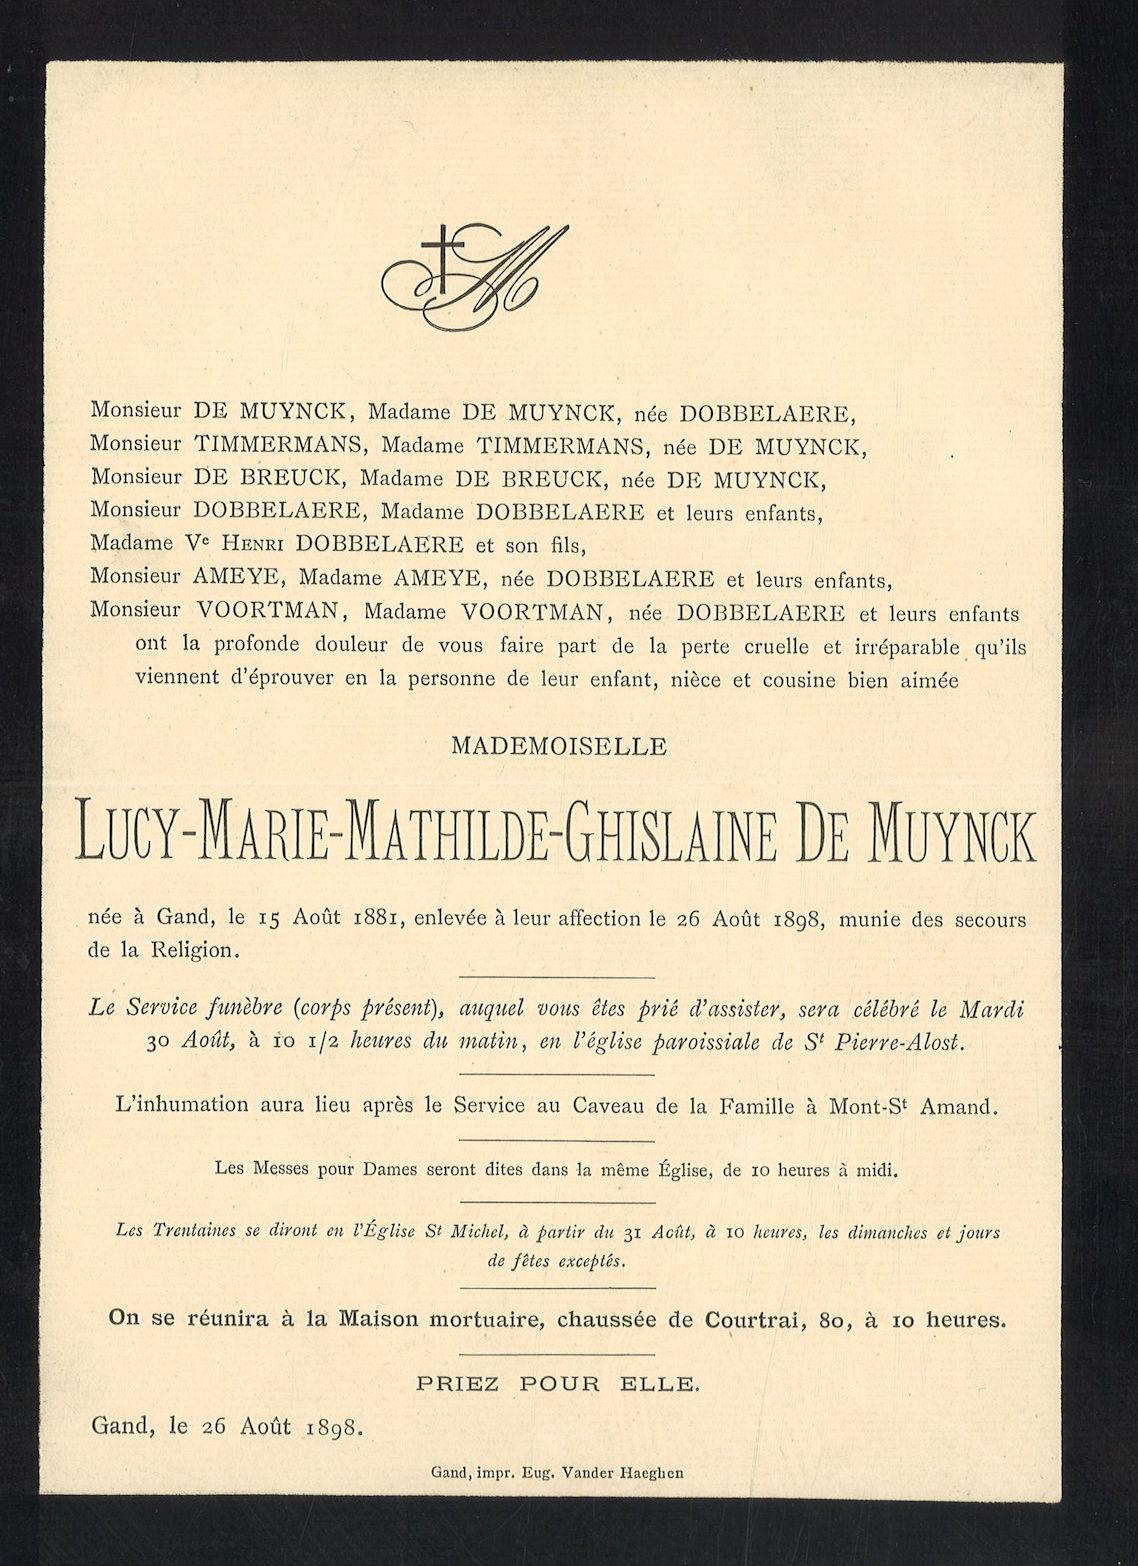 Lucy-Marie-Mathilde-Ghislaine De Muynck